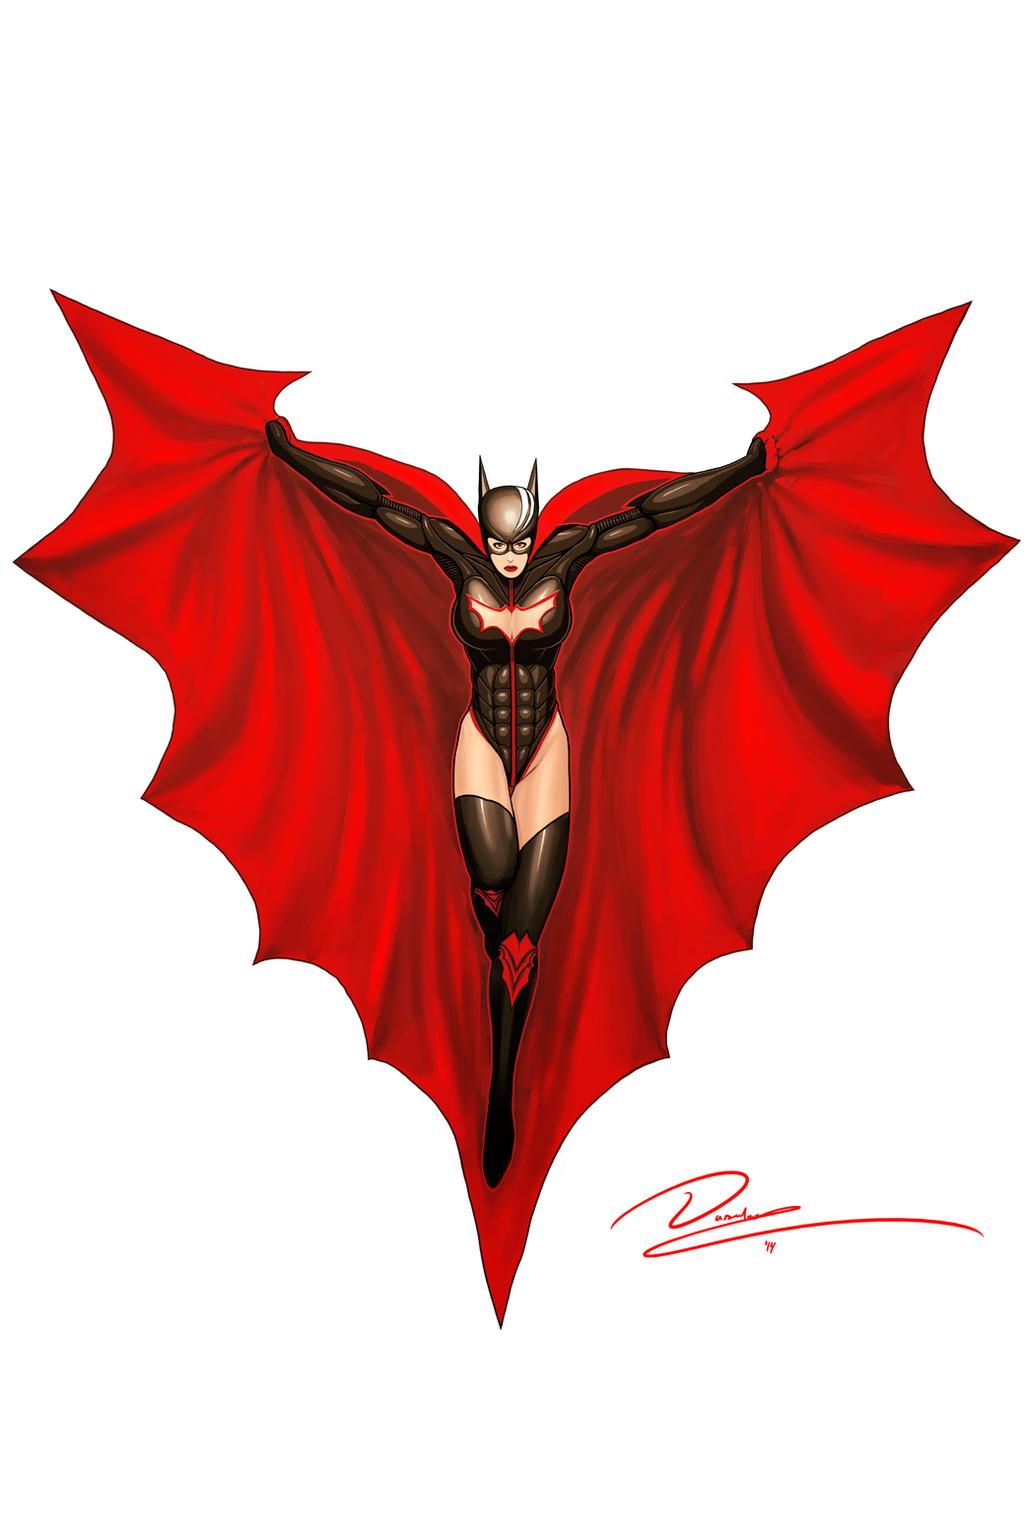 Scarlette Fusion: Batgirl Beyond by Durandus